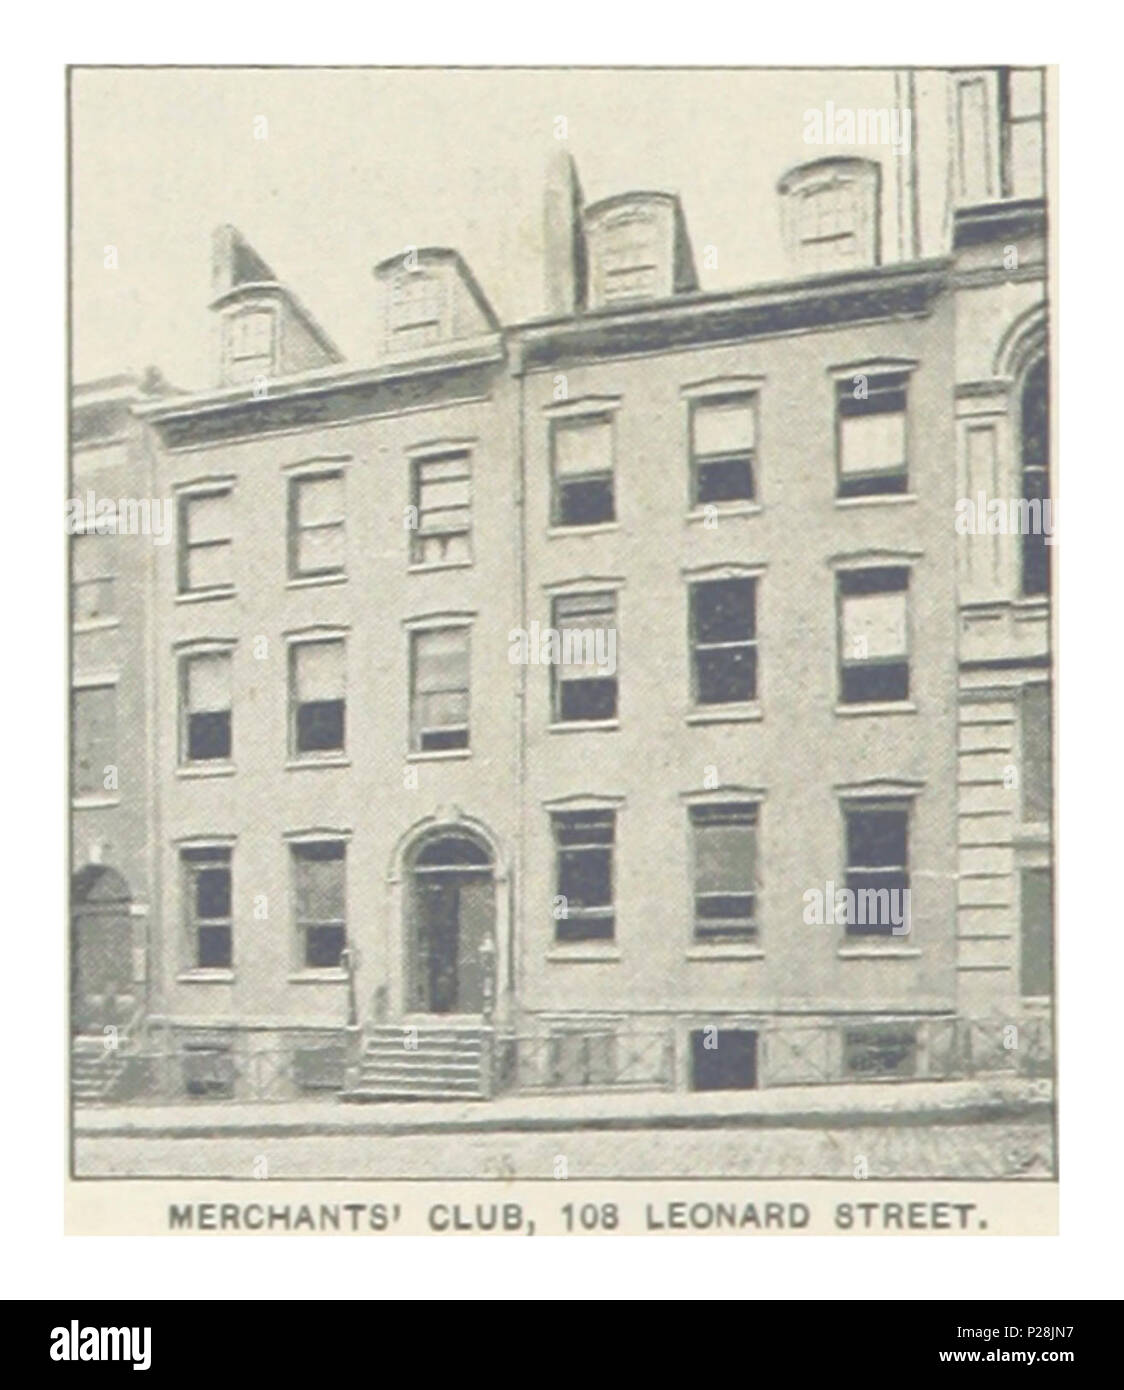 (King1893NYC) pg564 MERCHANTS' CLUB, 108 LEONARD STREET. - Stock Image